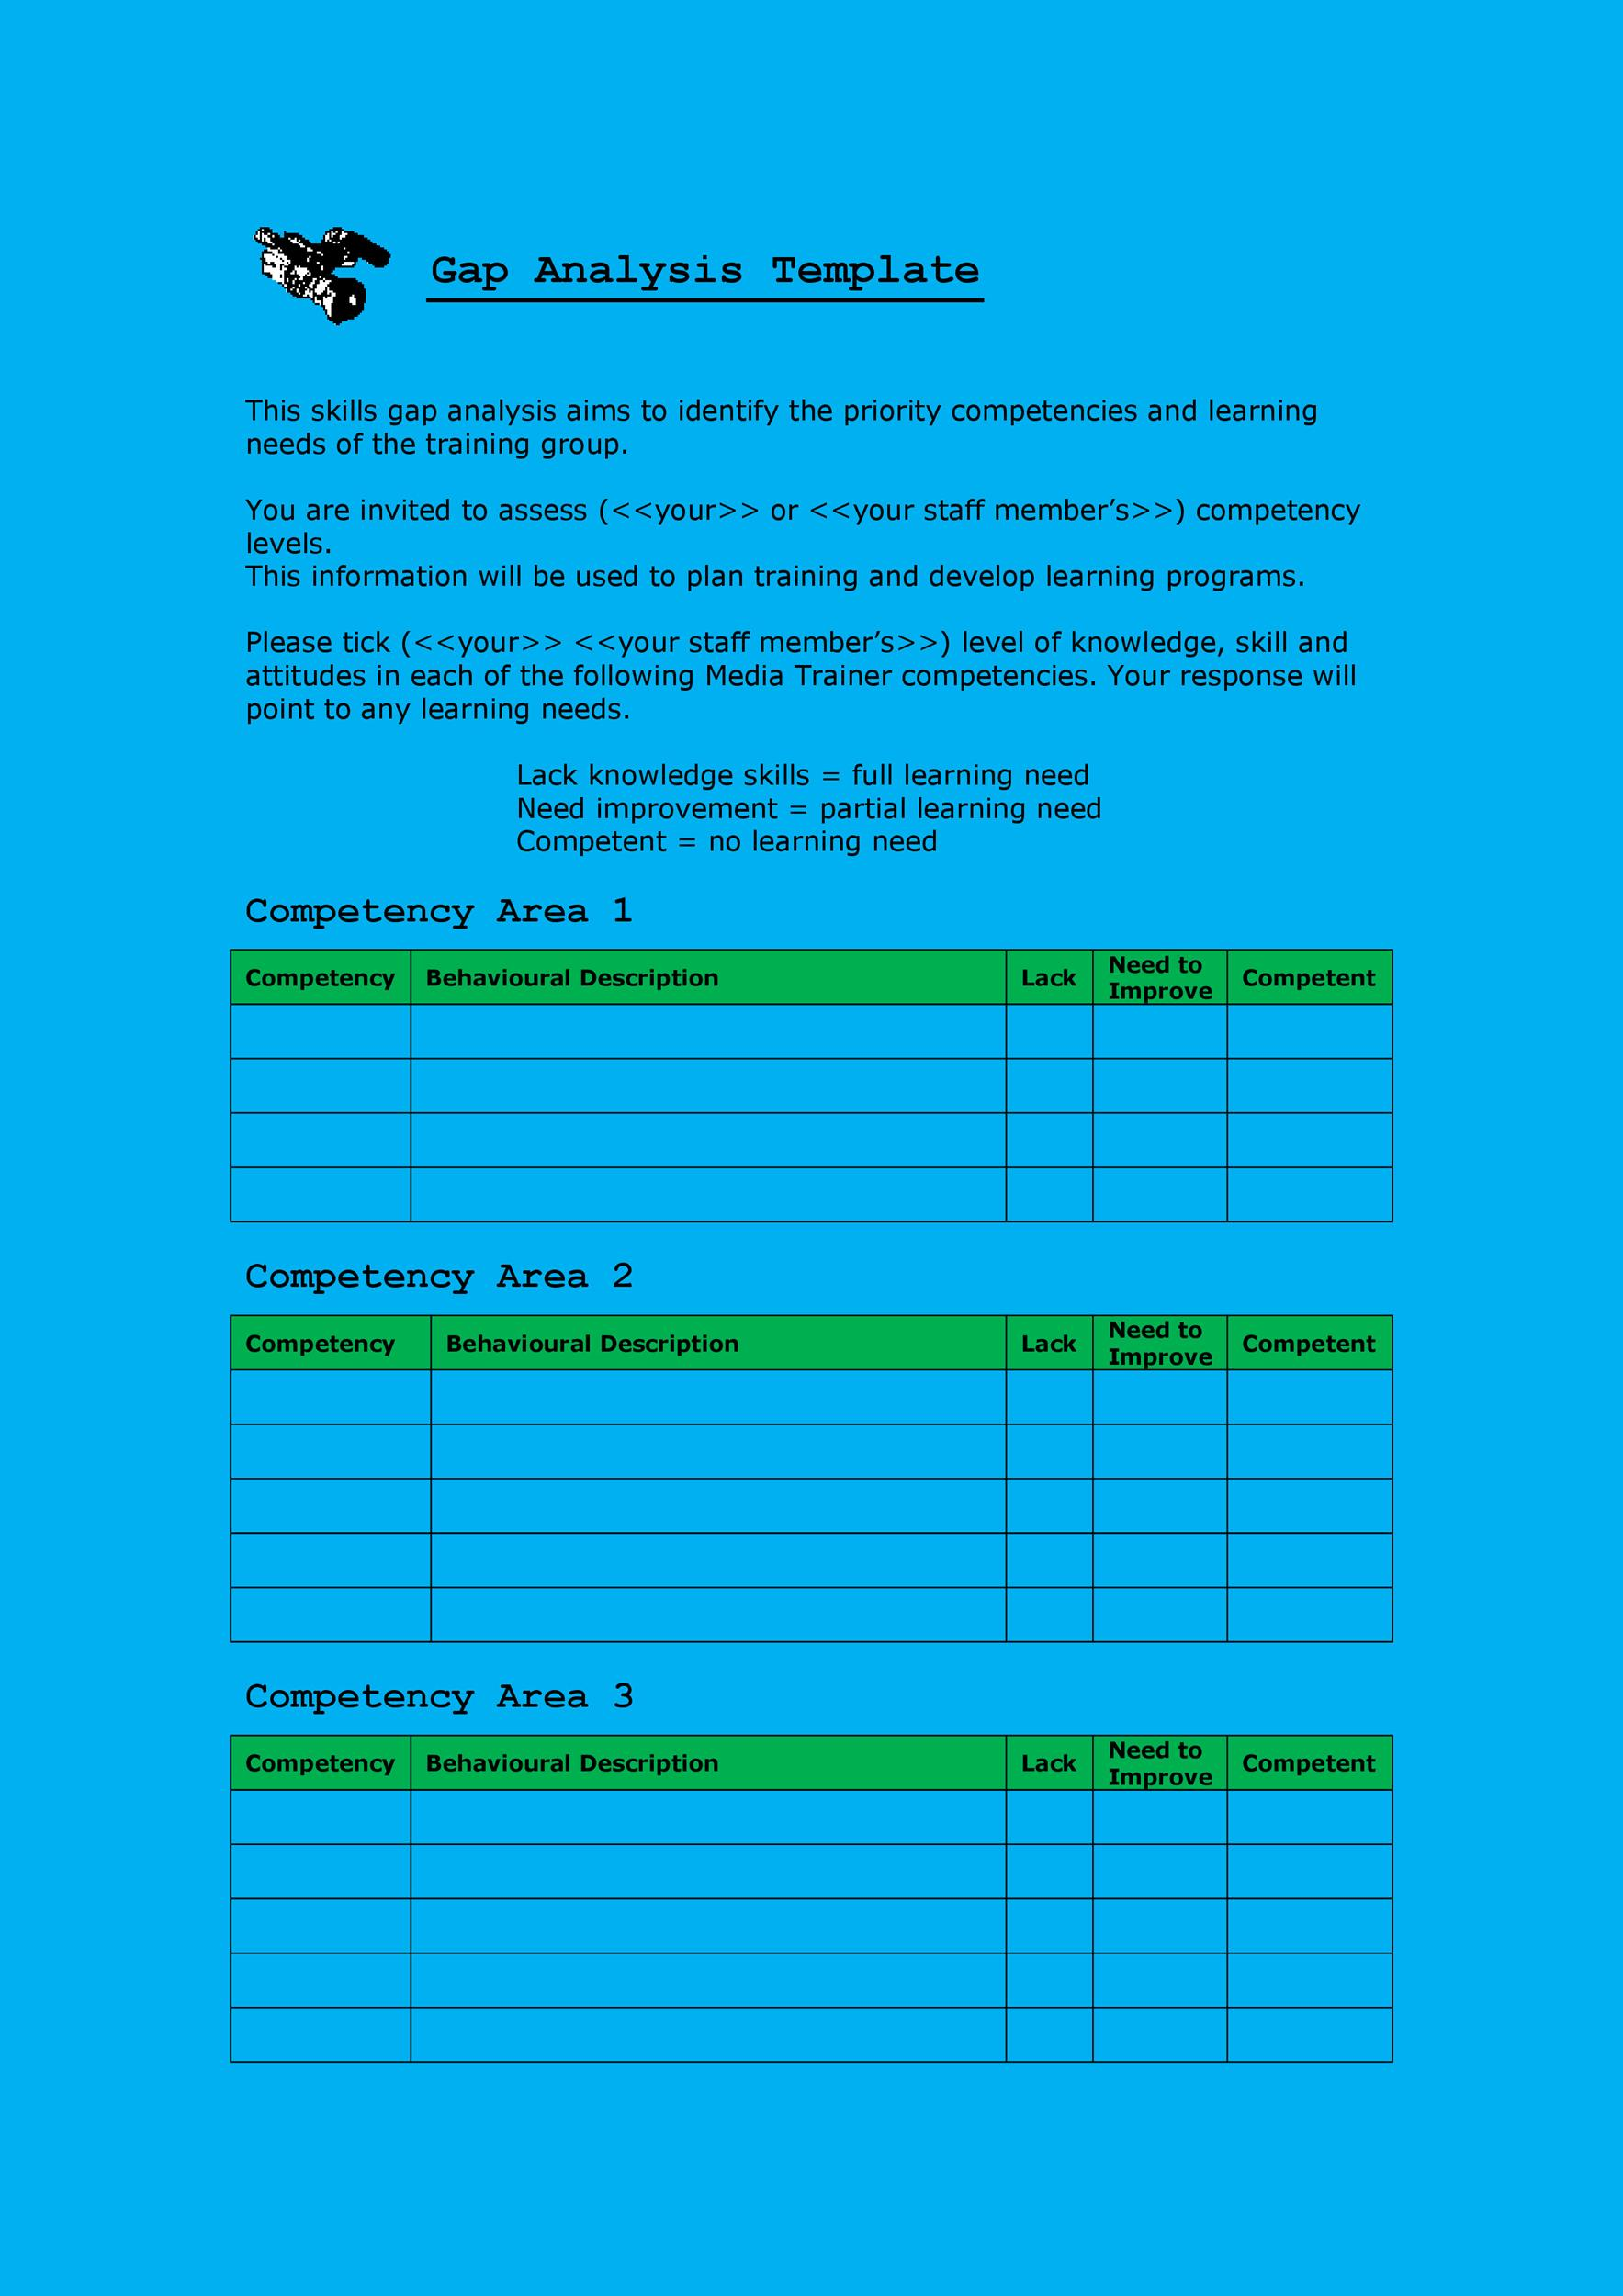 40 gap analysis templates  u0026 exmaples  word  excel  pdf